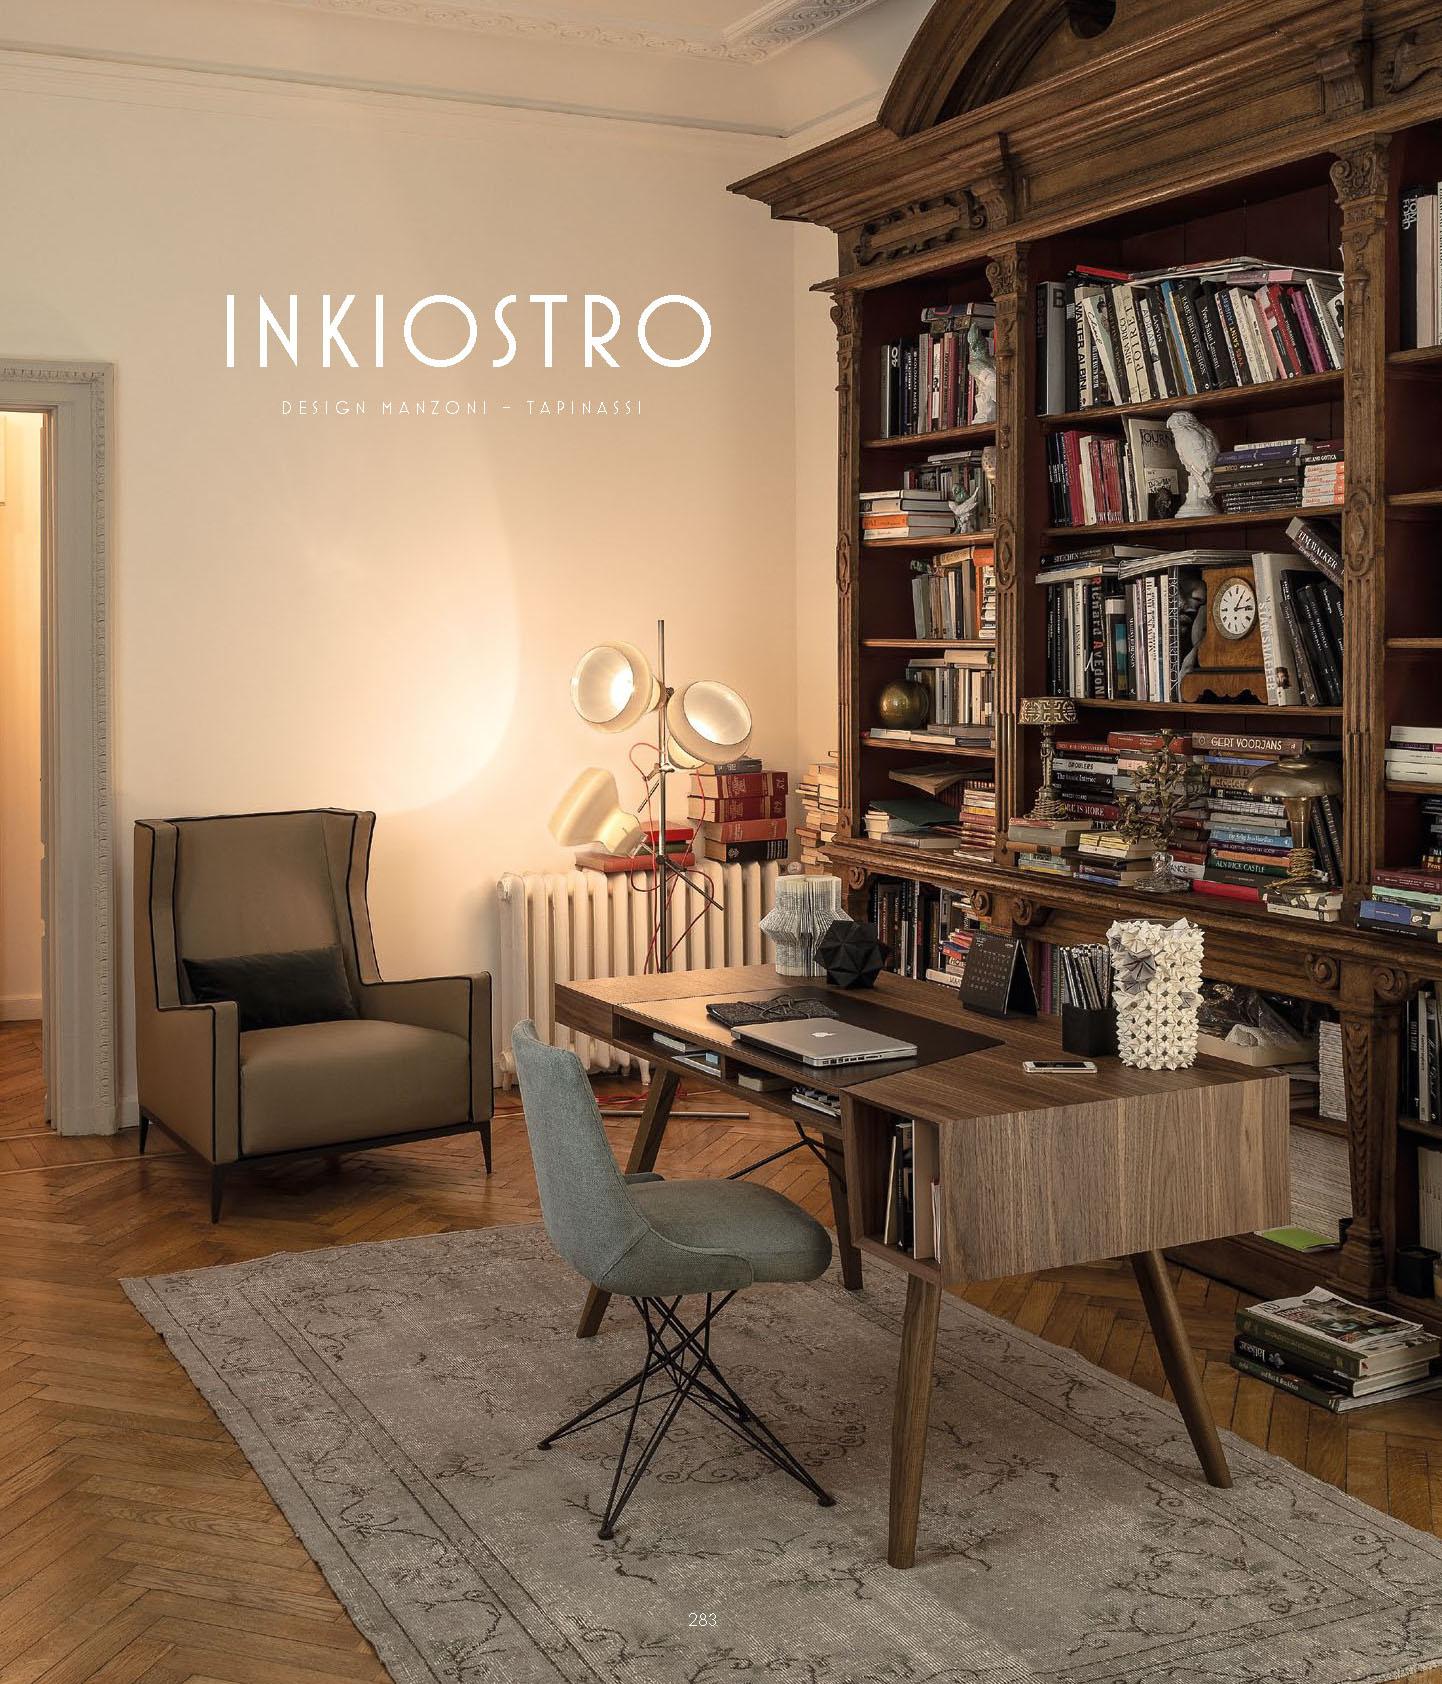 Inkiostro - Arketipo Firenze